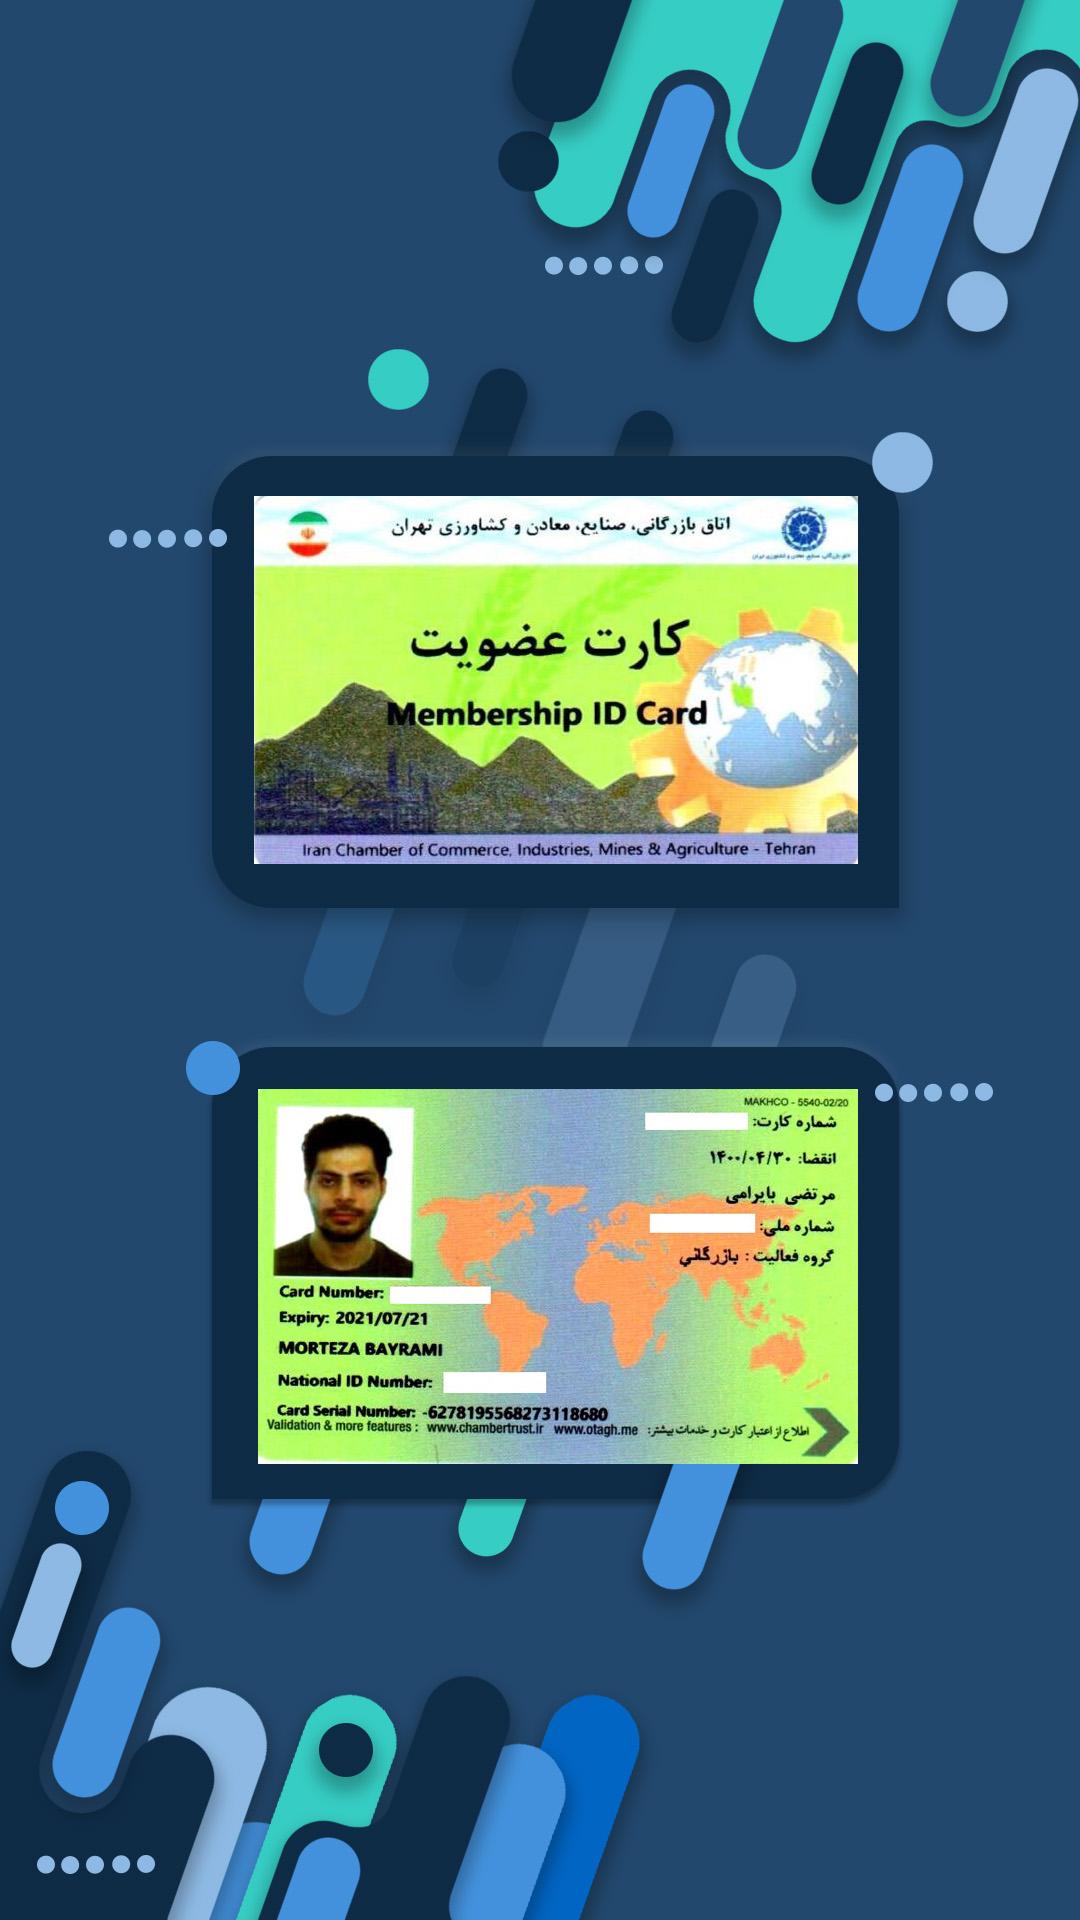 mahan-card-joind-.8-3999